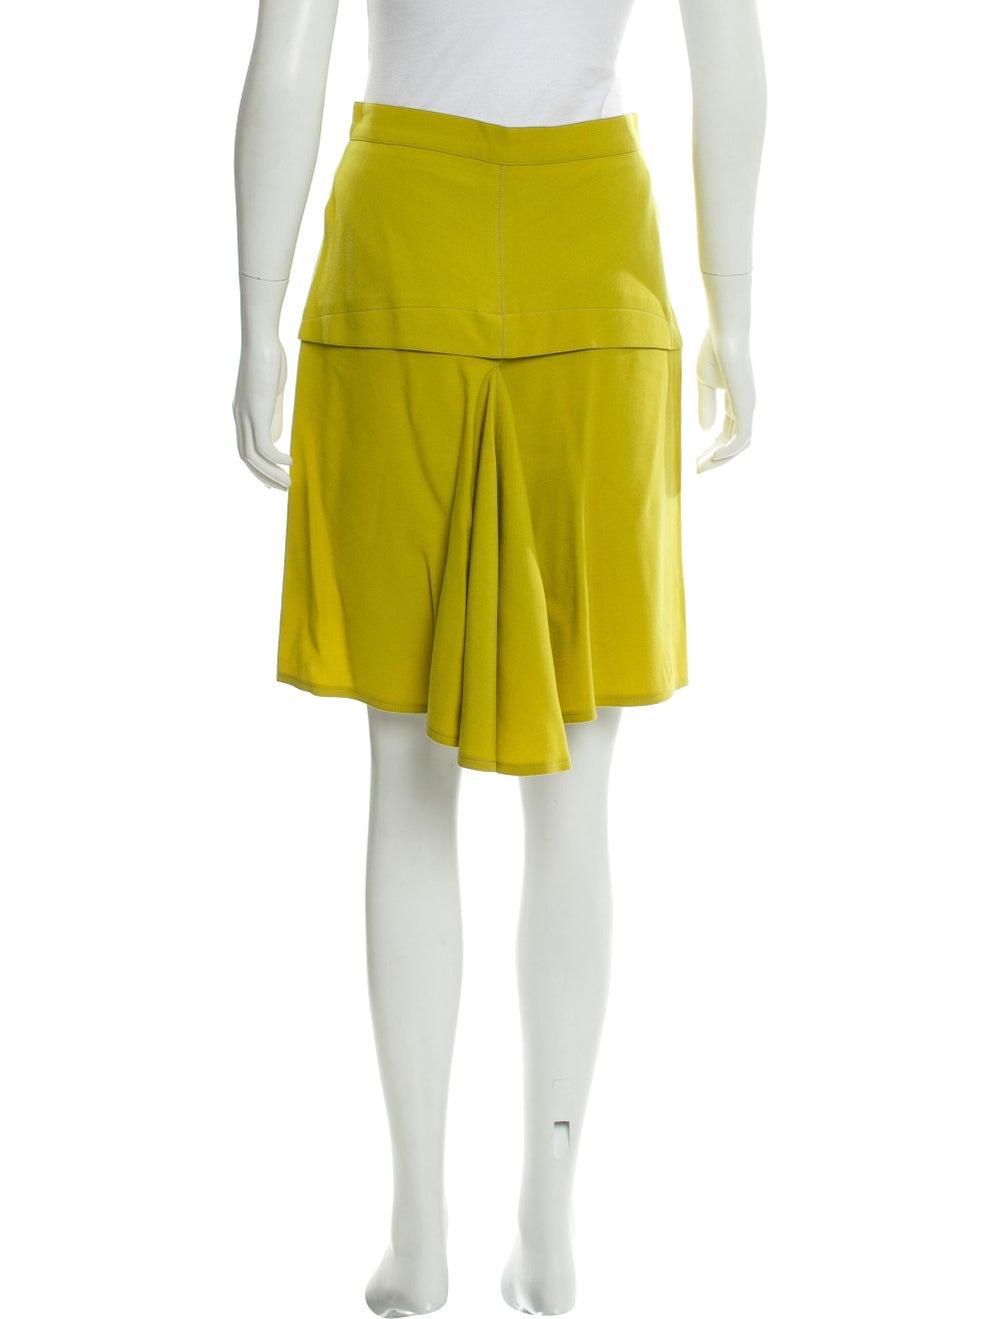 Alaïa Wool Knee-Length Skirt Chartreuse - image 3